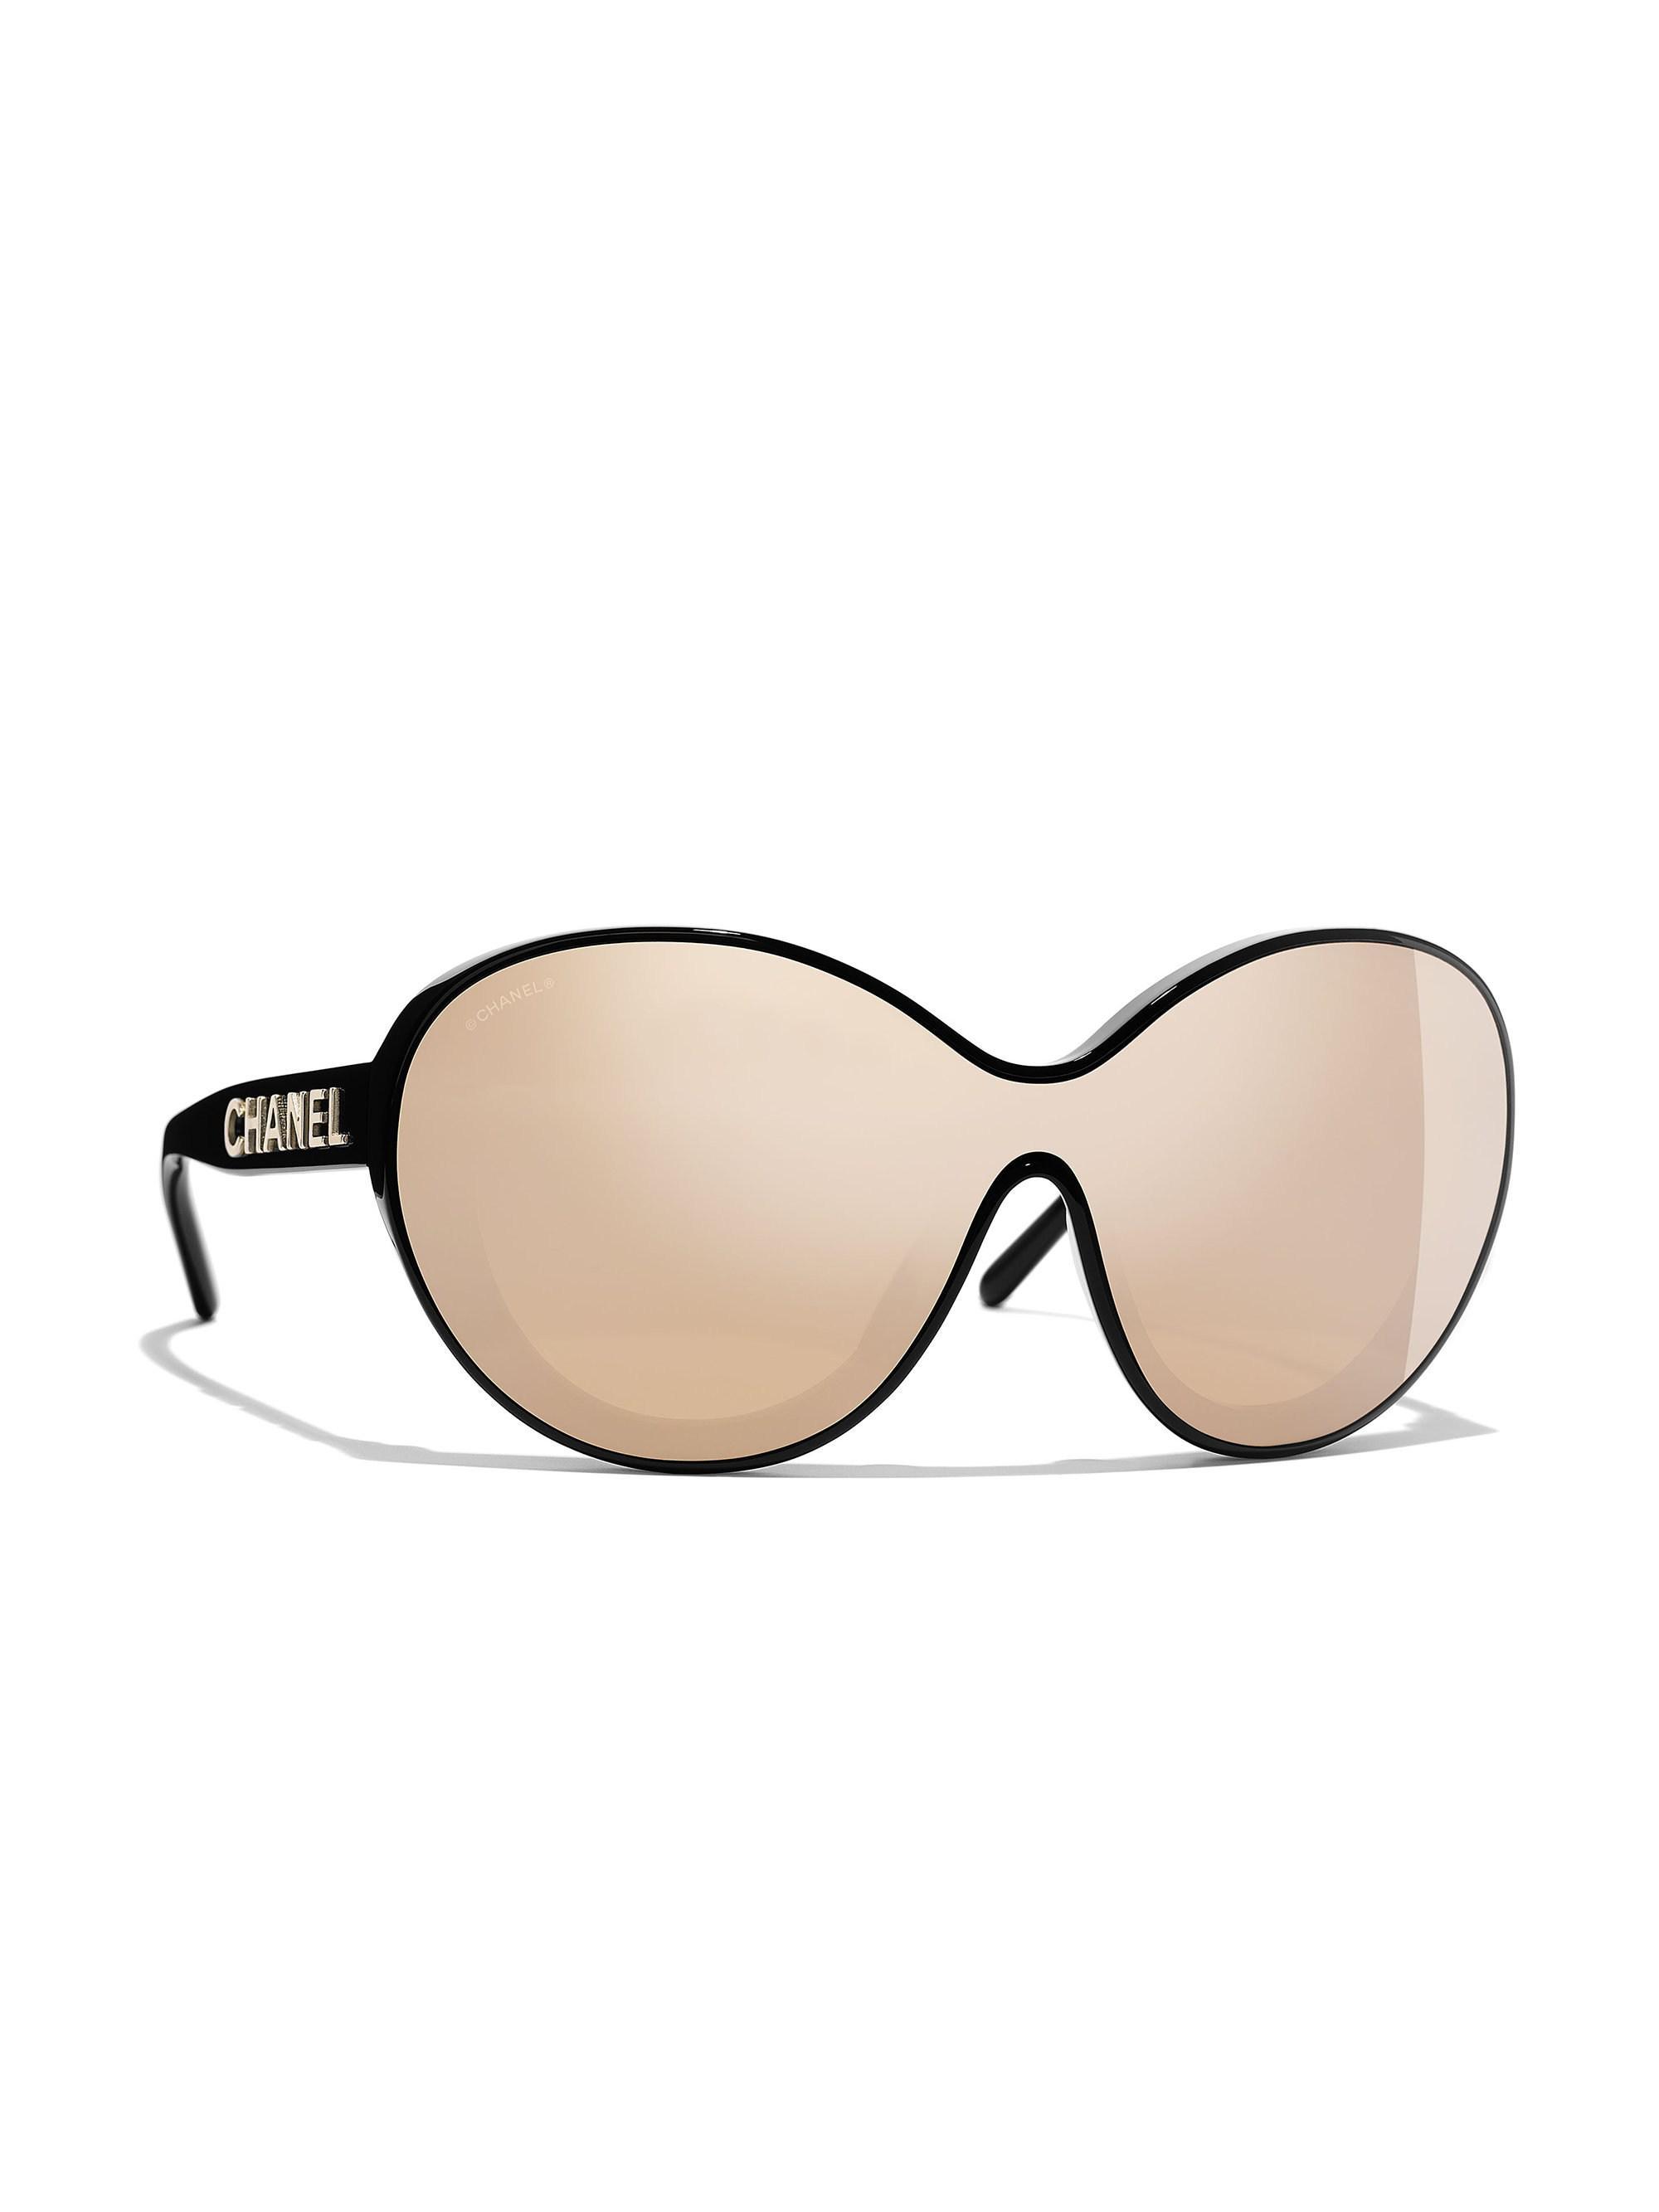 7ed85c11c63 Lyst - Chanel Shield Sunglasses in Black